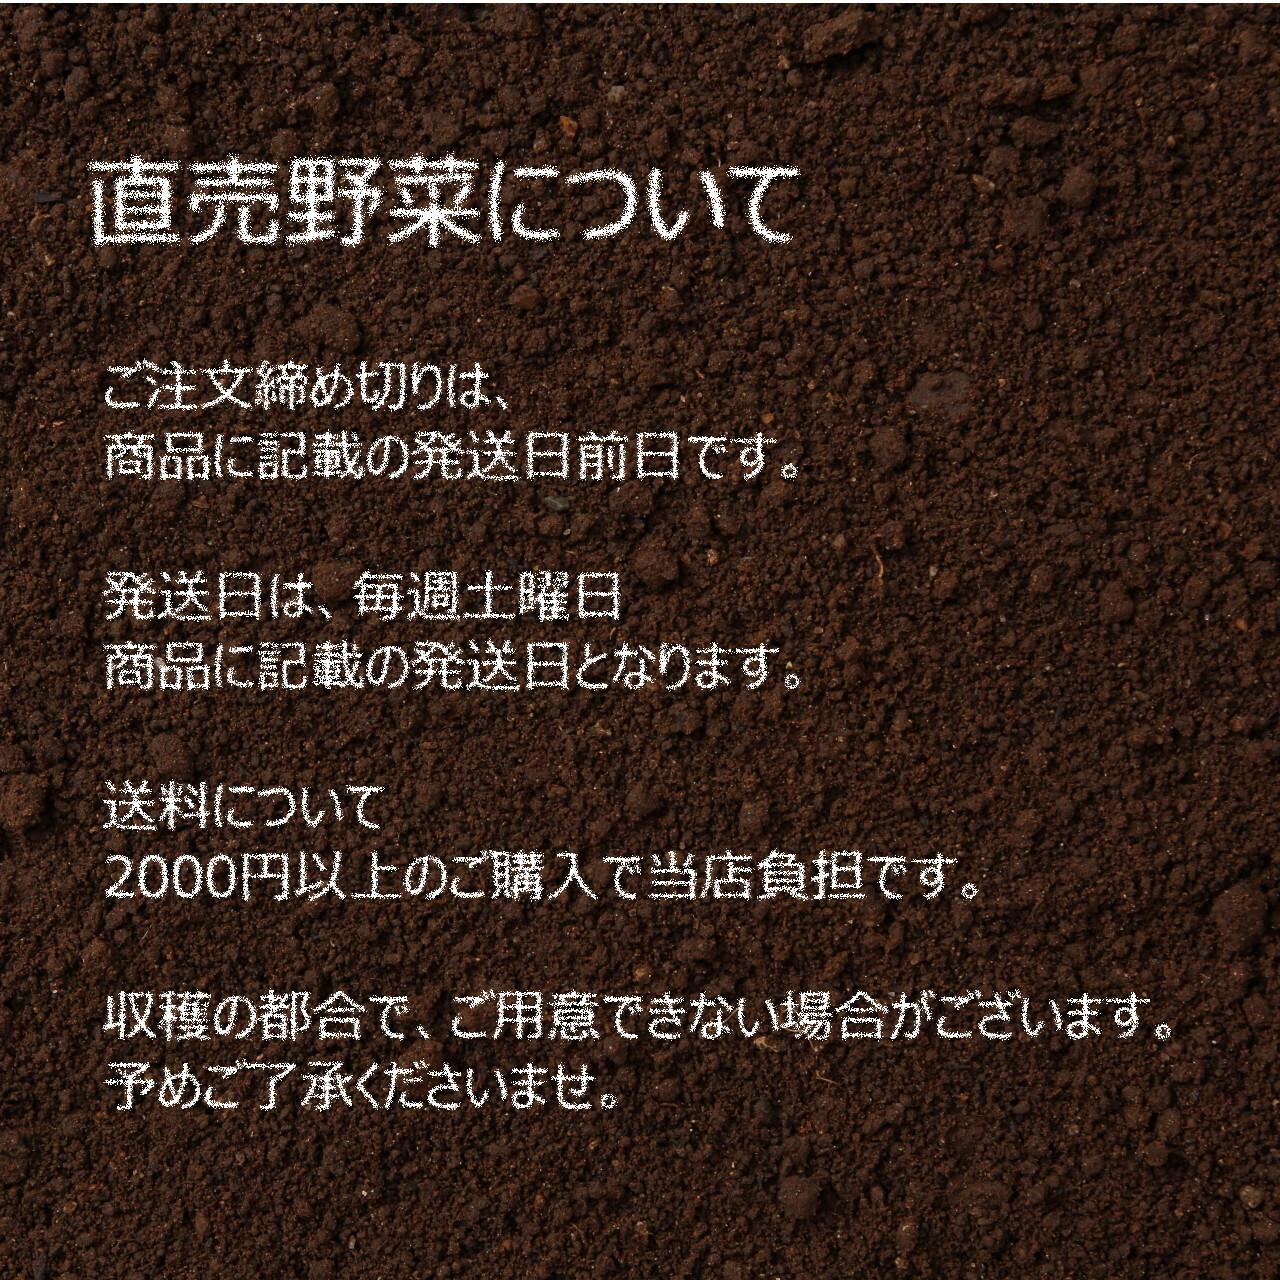 春の新鮮野菜 大根 約 2~3本: 5月の朝採り直売野菜 5月30日発送予定